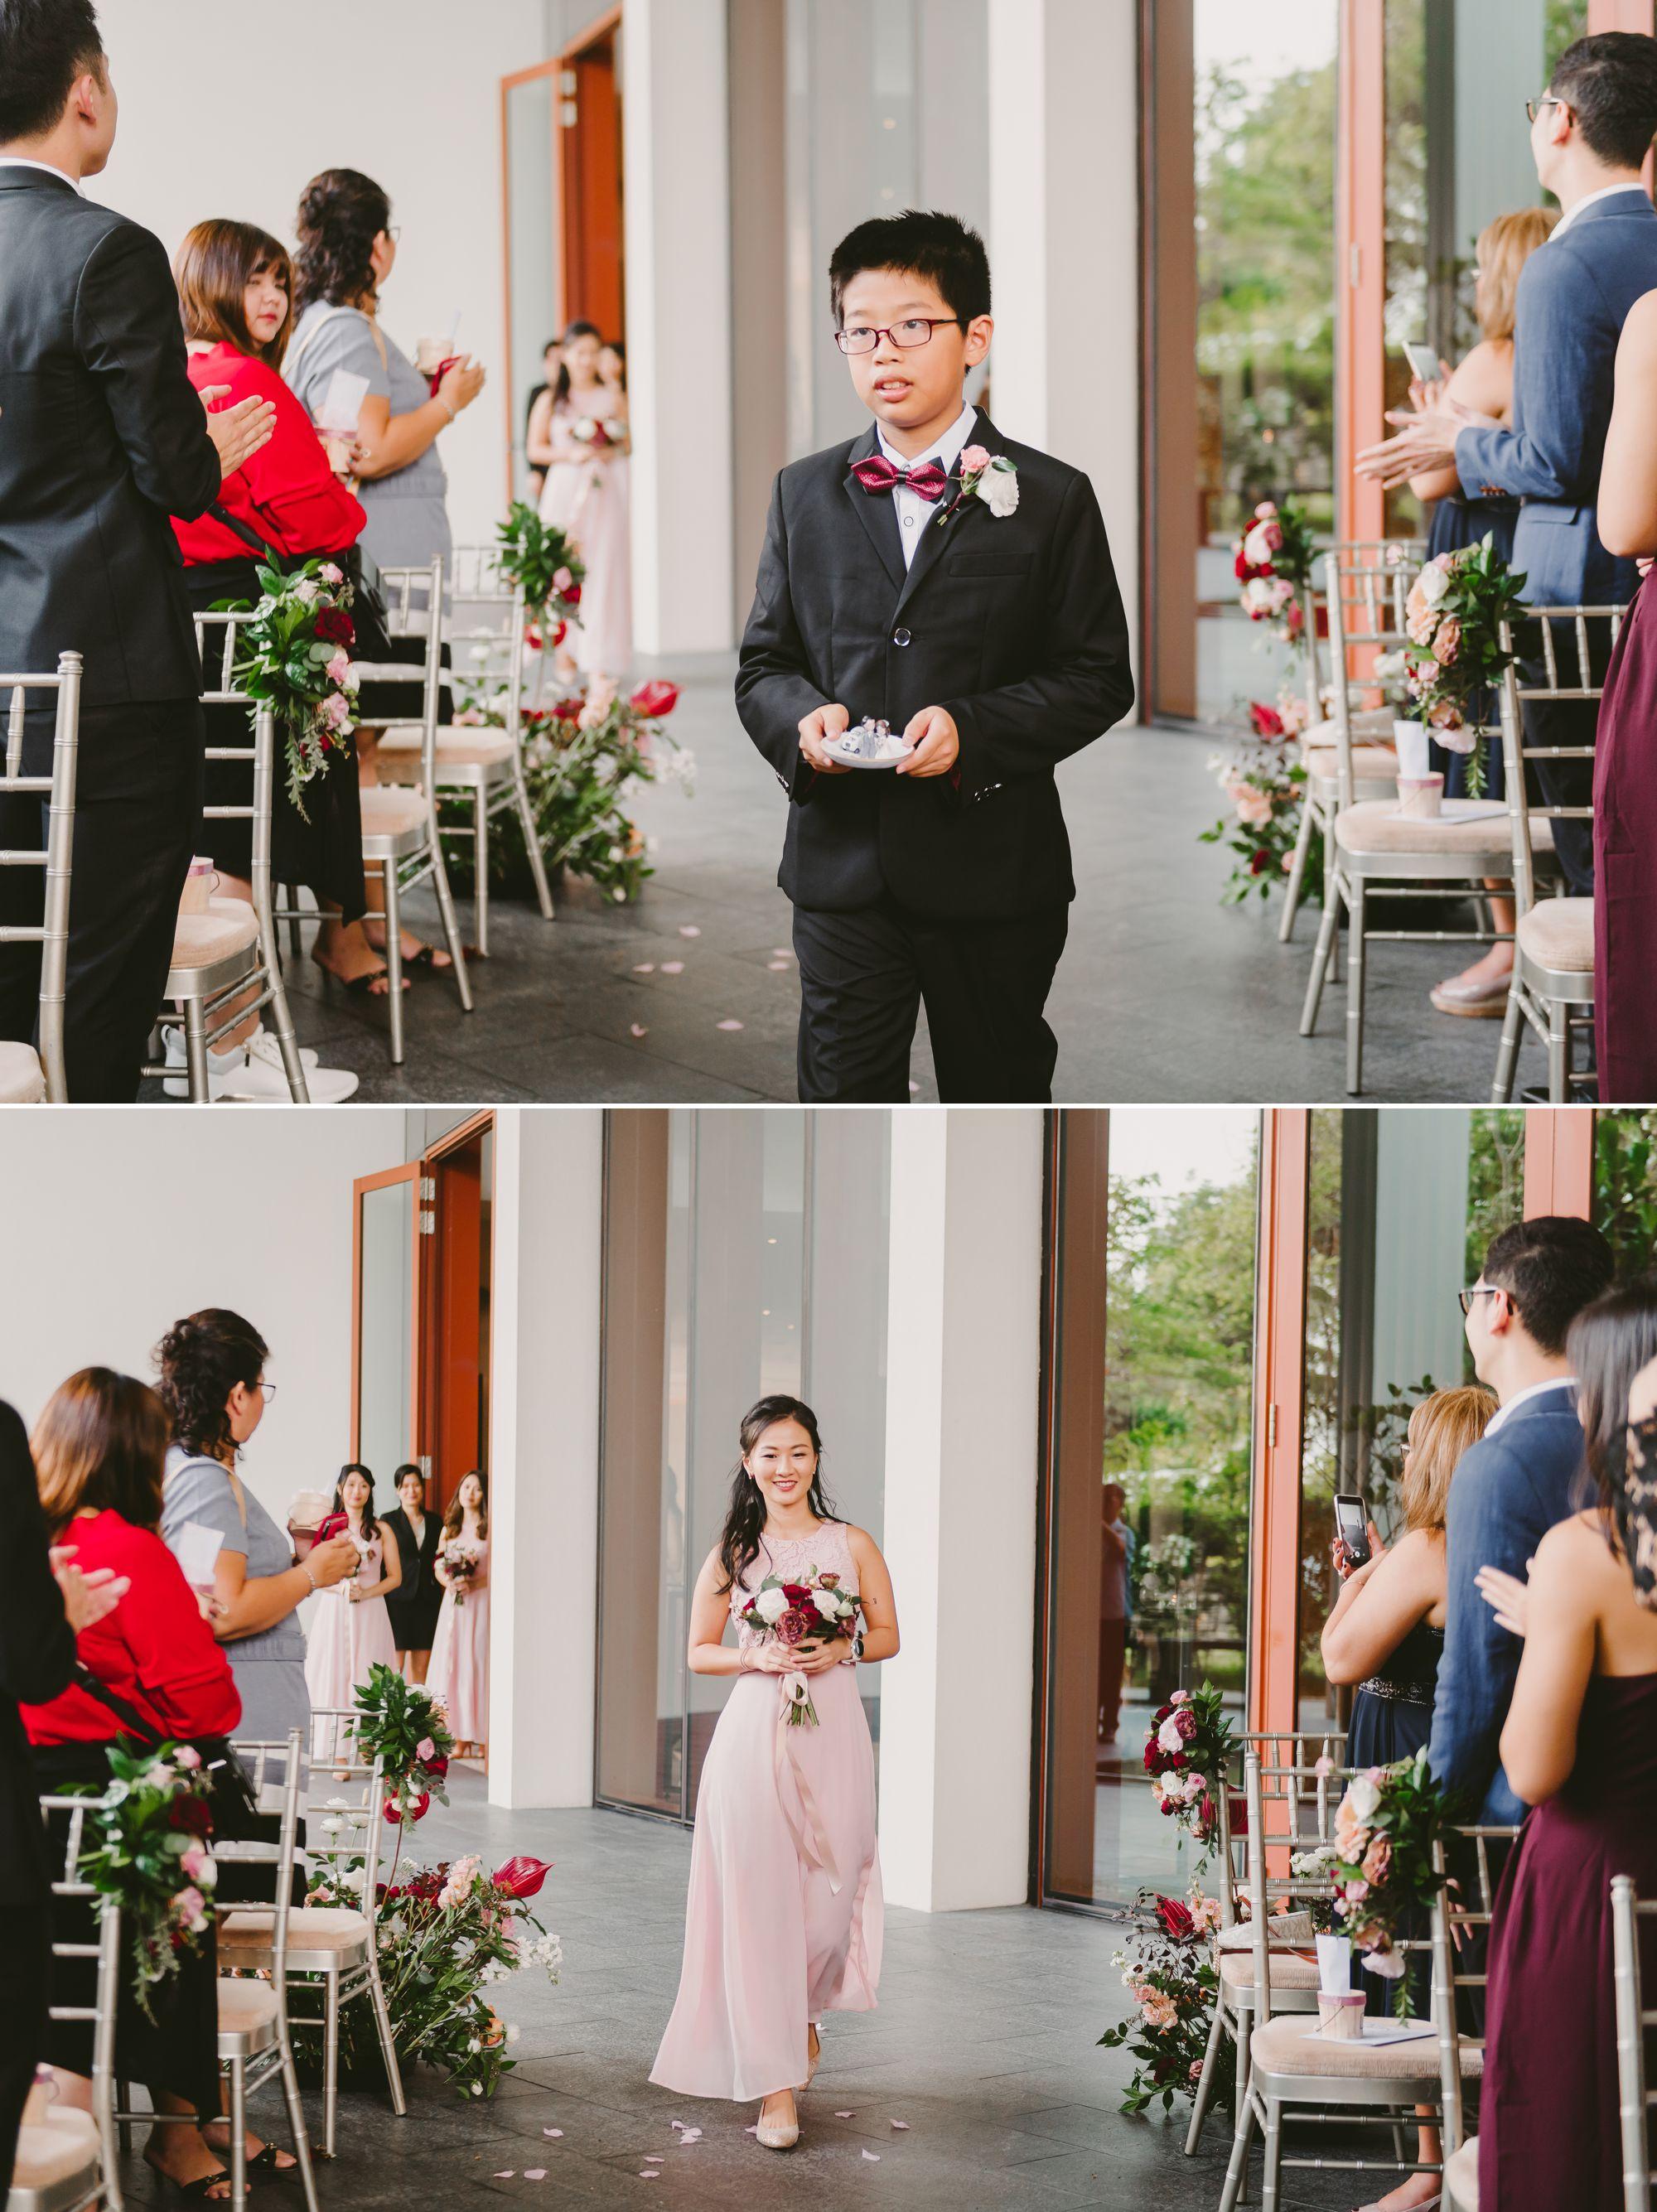 capella_wedding_photography_ 39.jpg